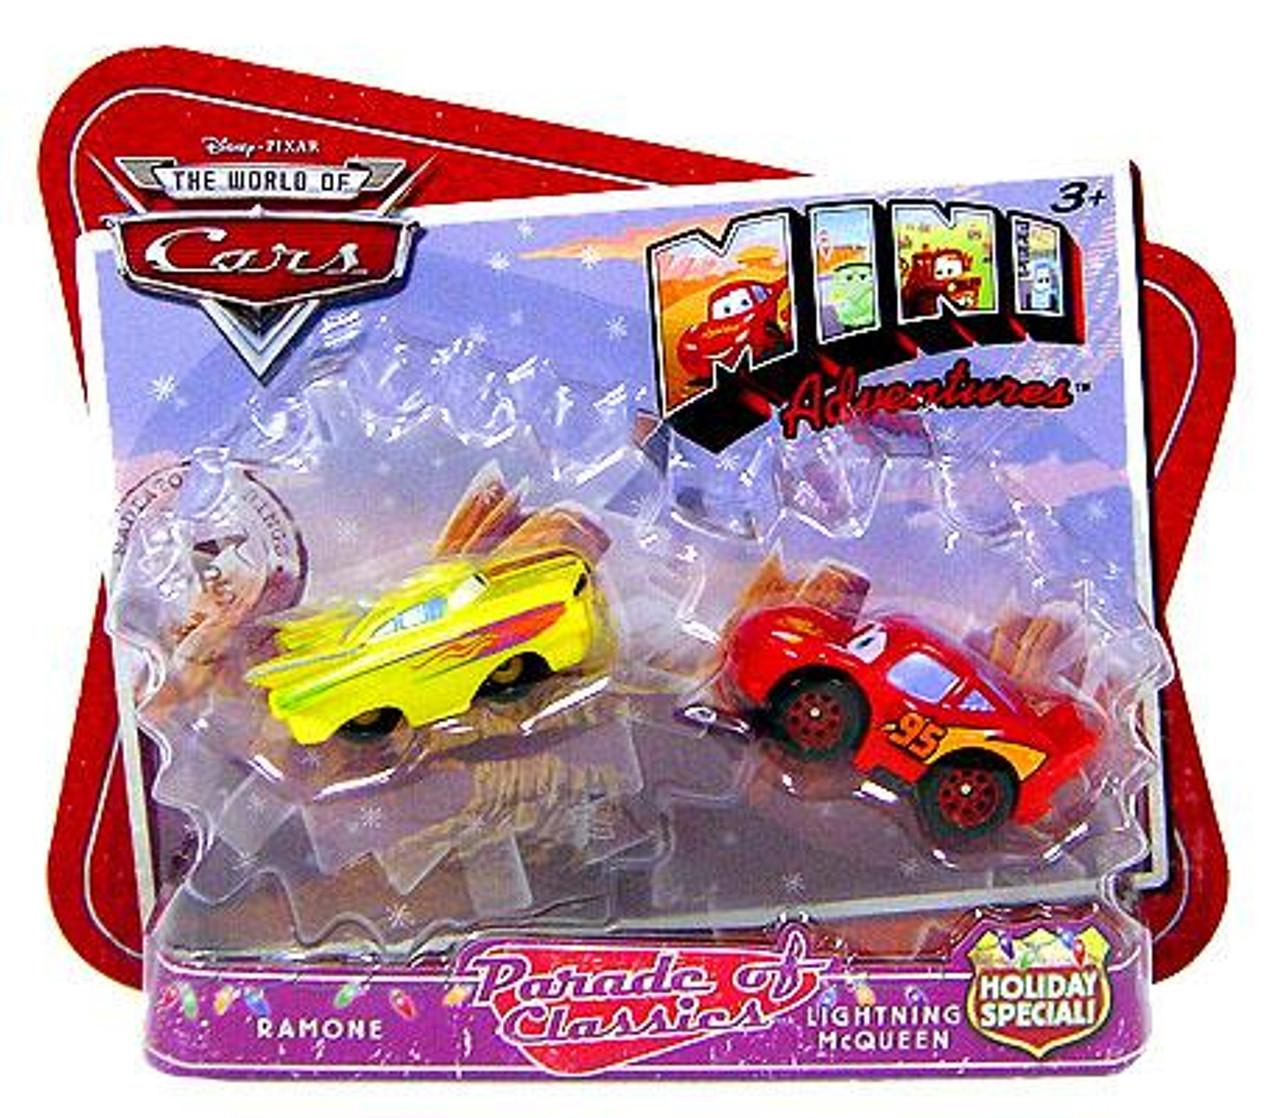 Disney Cars The World of Cars Mini Adventures Parade of Classics Exclusive Plastic Car 2-Pack [Ramone & Lightning McQueen]